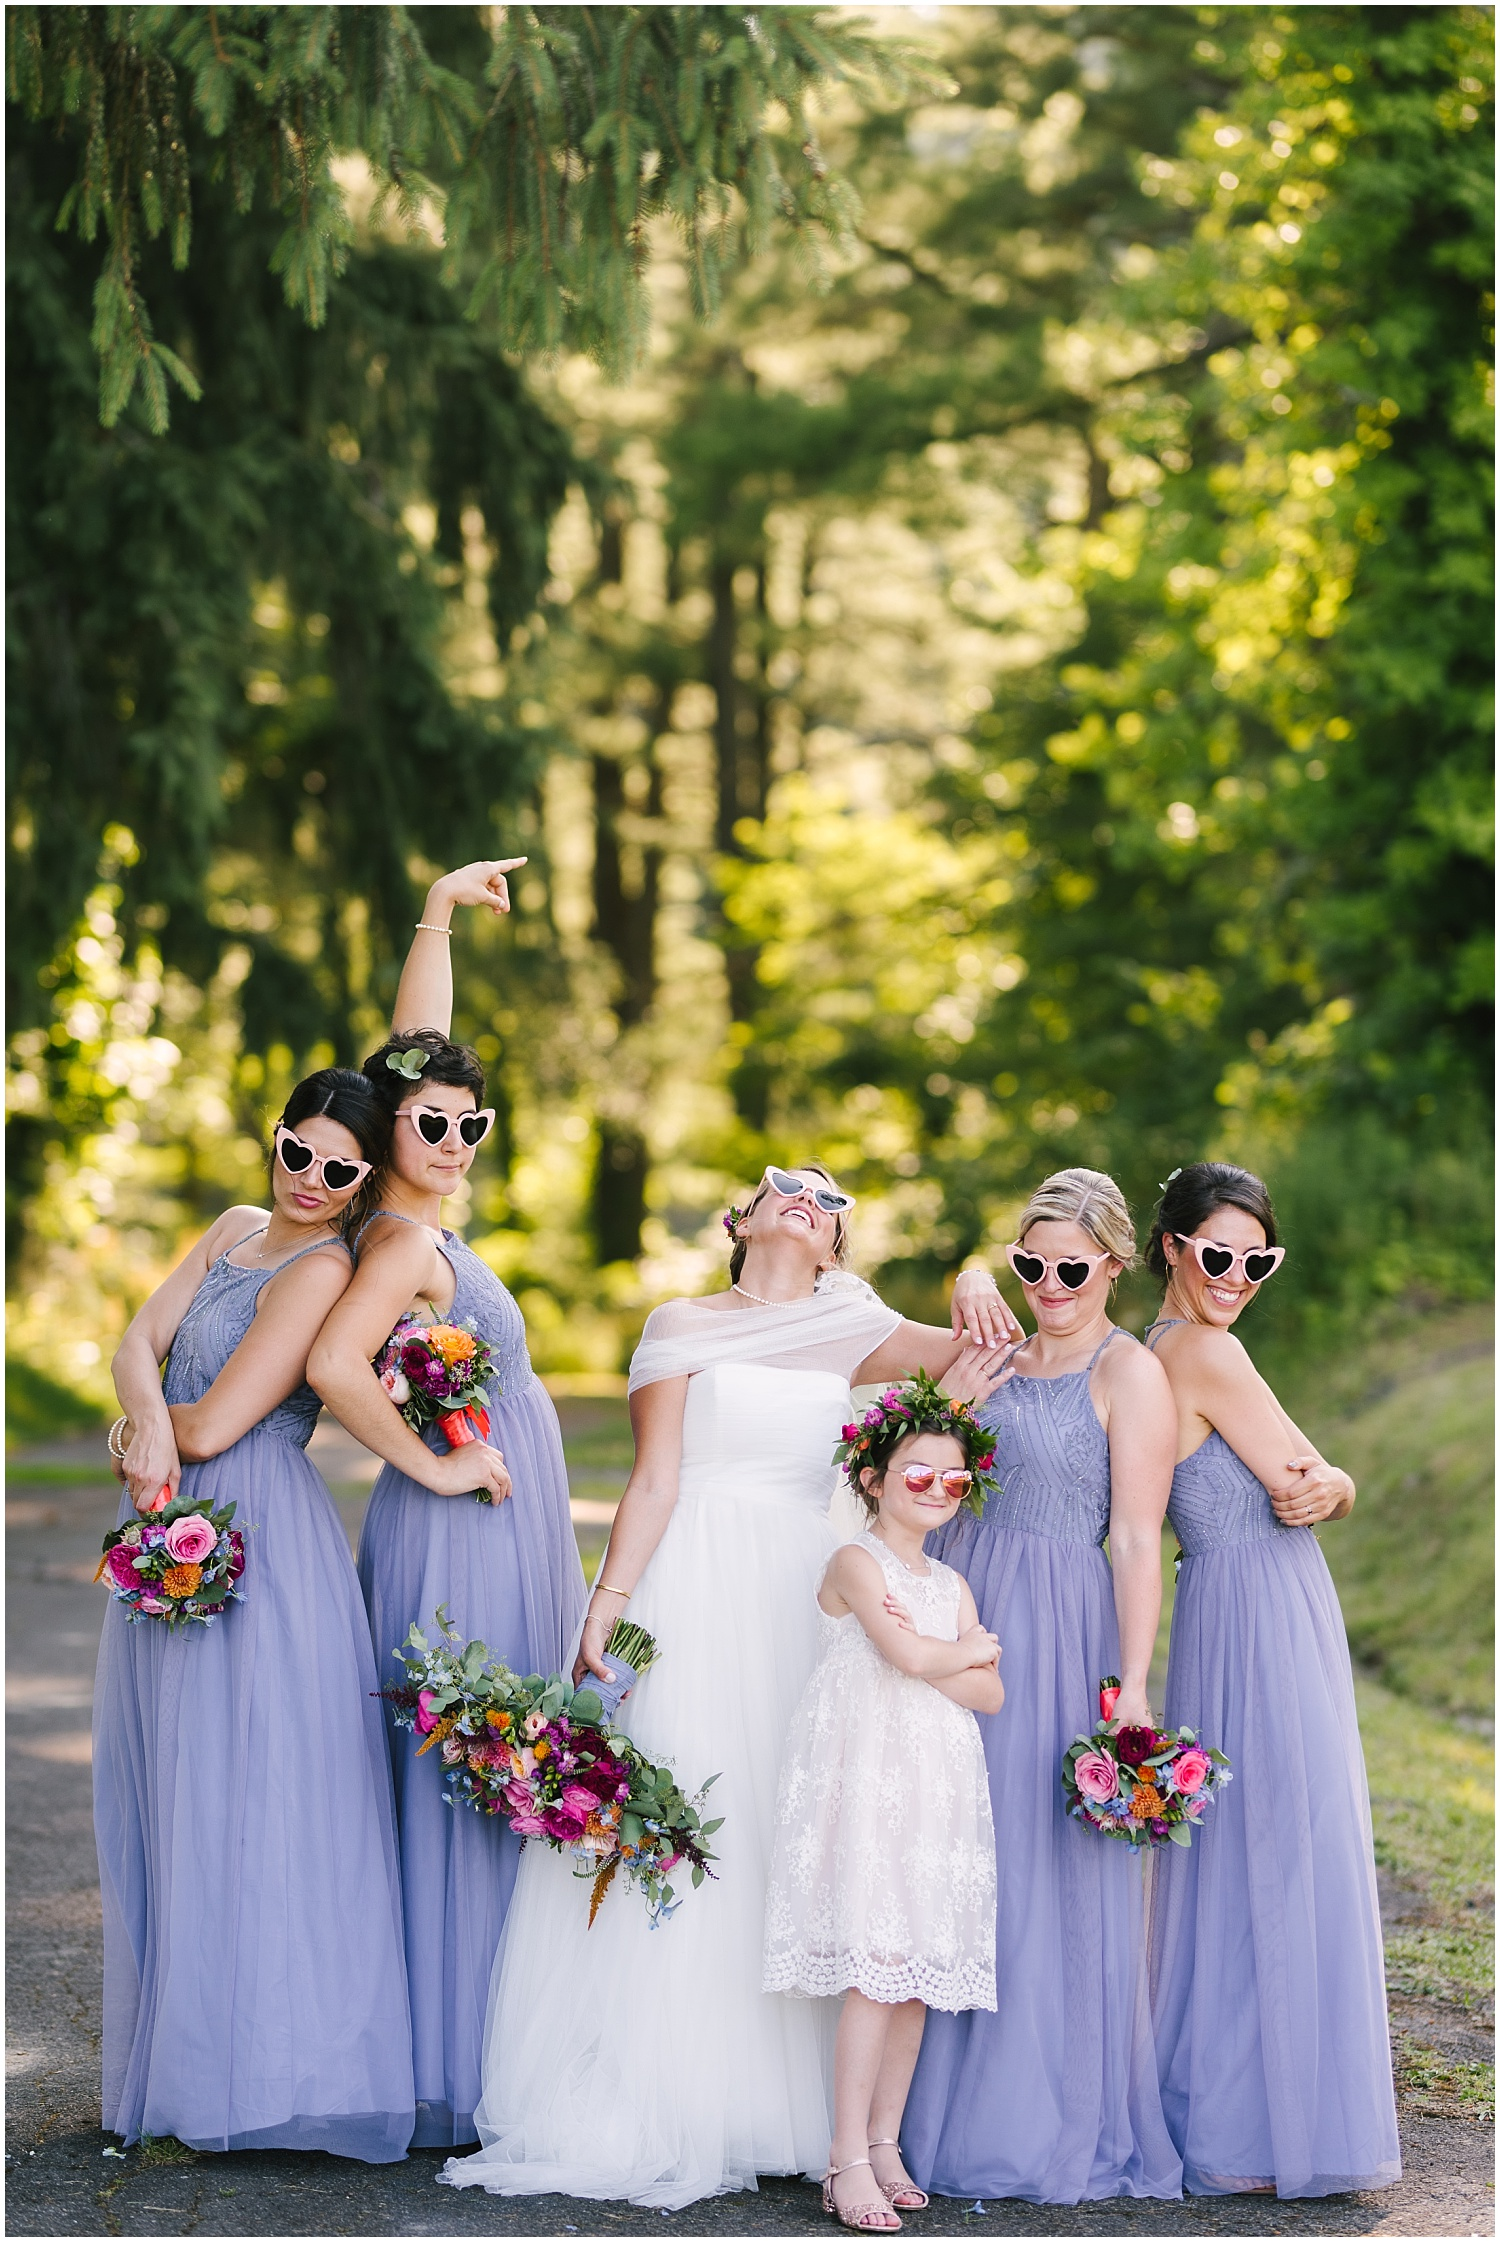 traditions+at+the+glen+wedding+binghamton+wedding (76).jpg